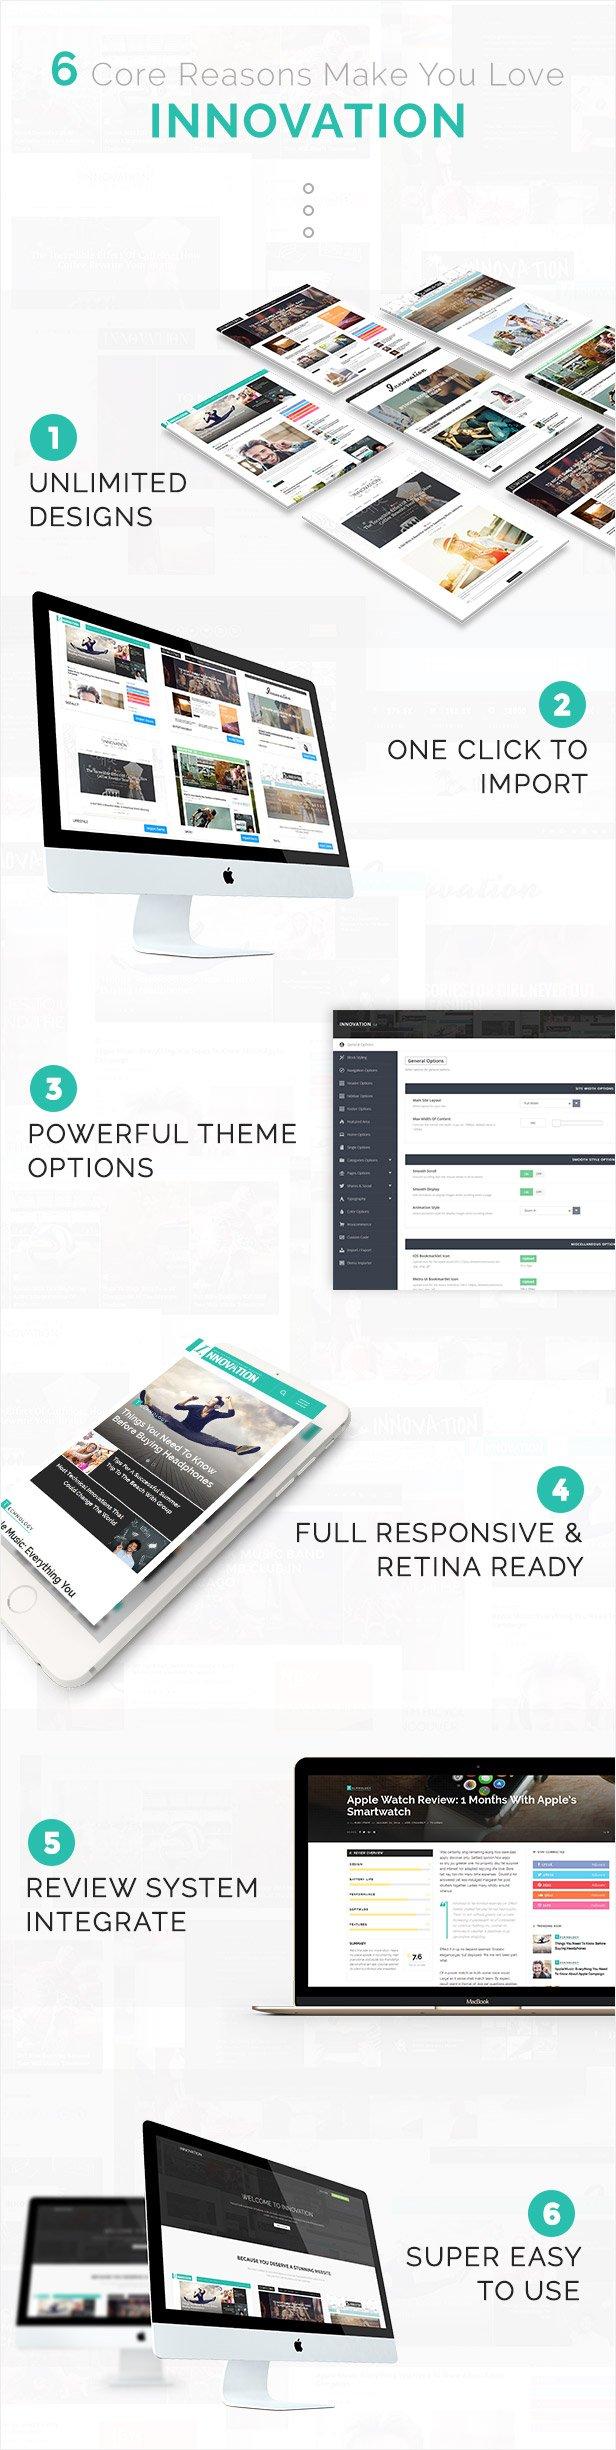 Innovation: Multi-Concept News, Magazine & Blog Theme - 11